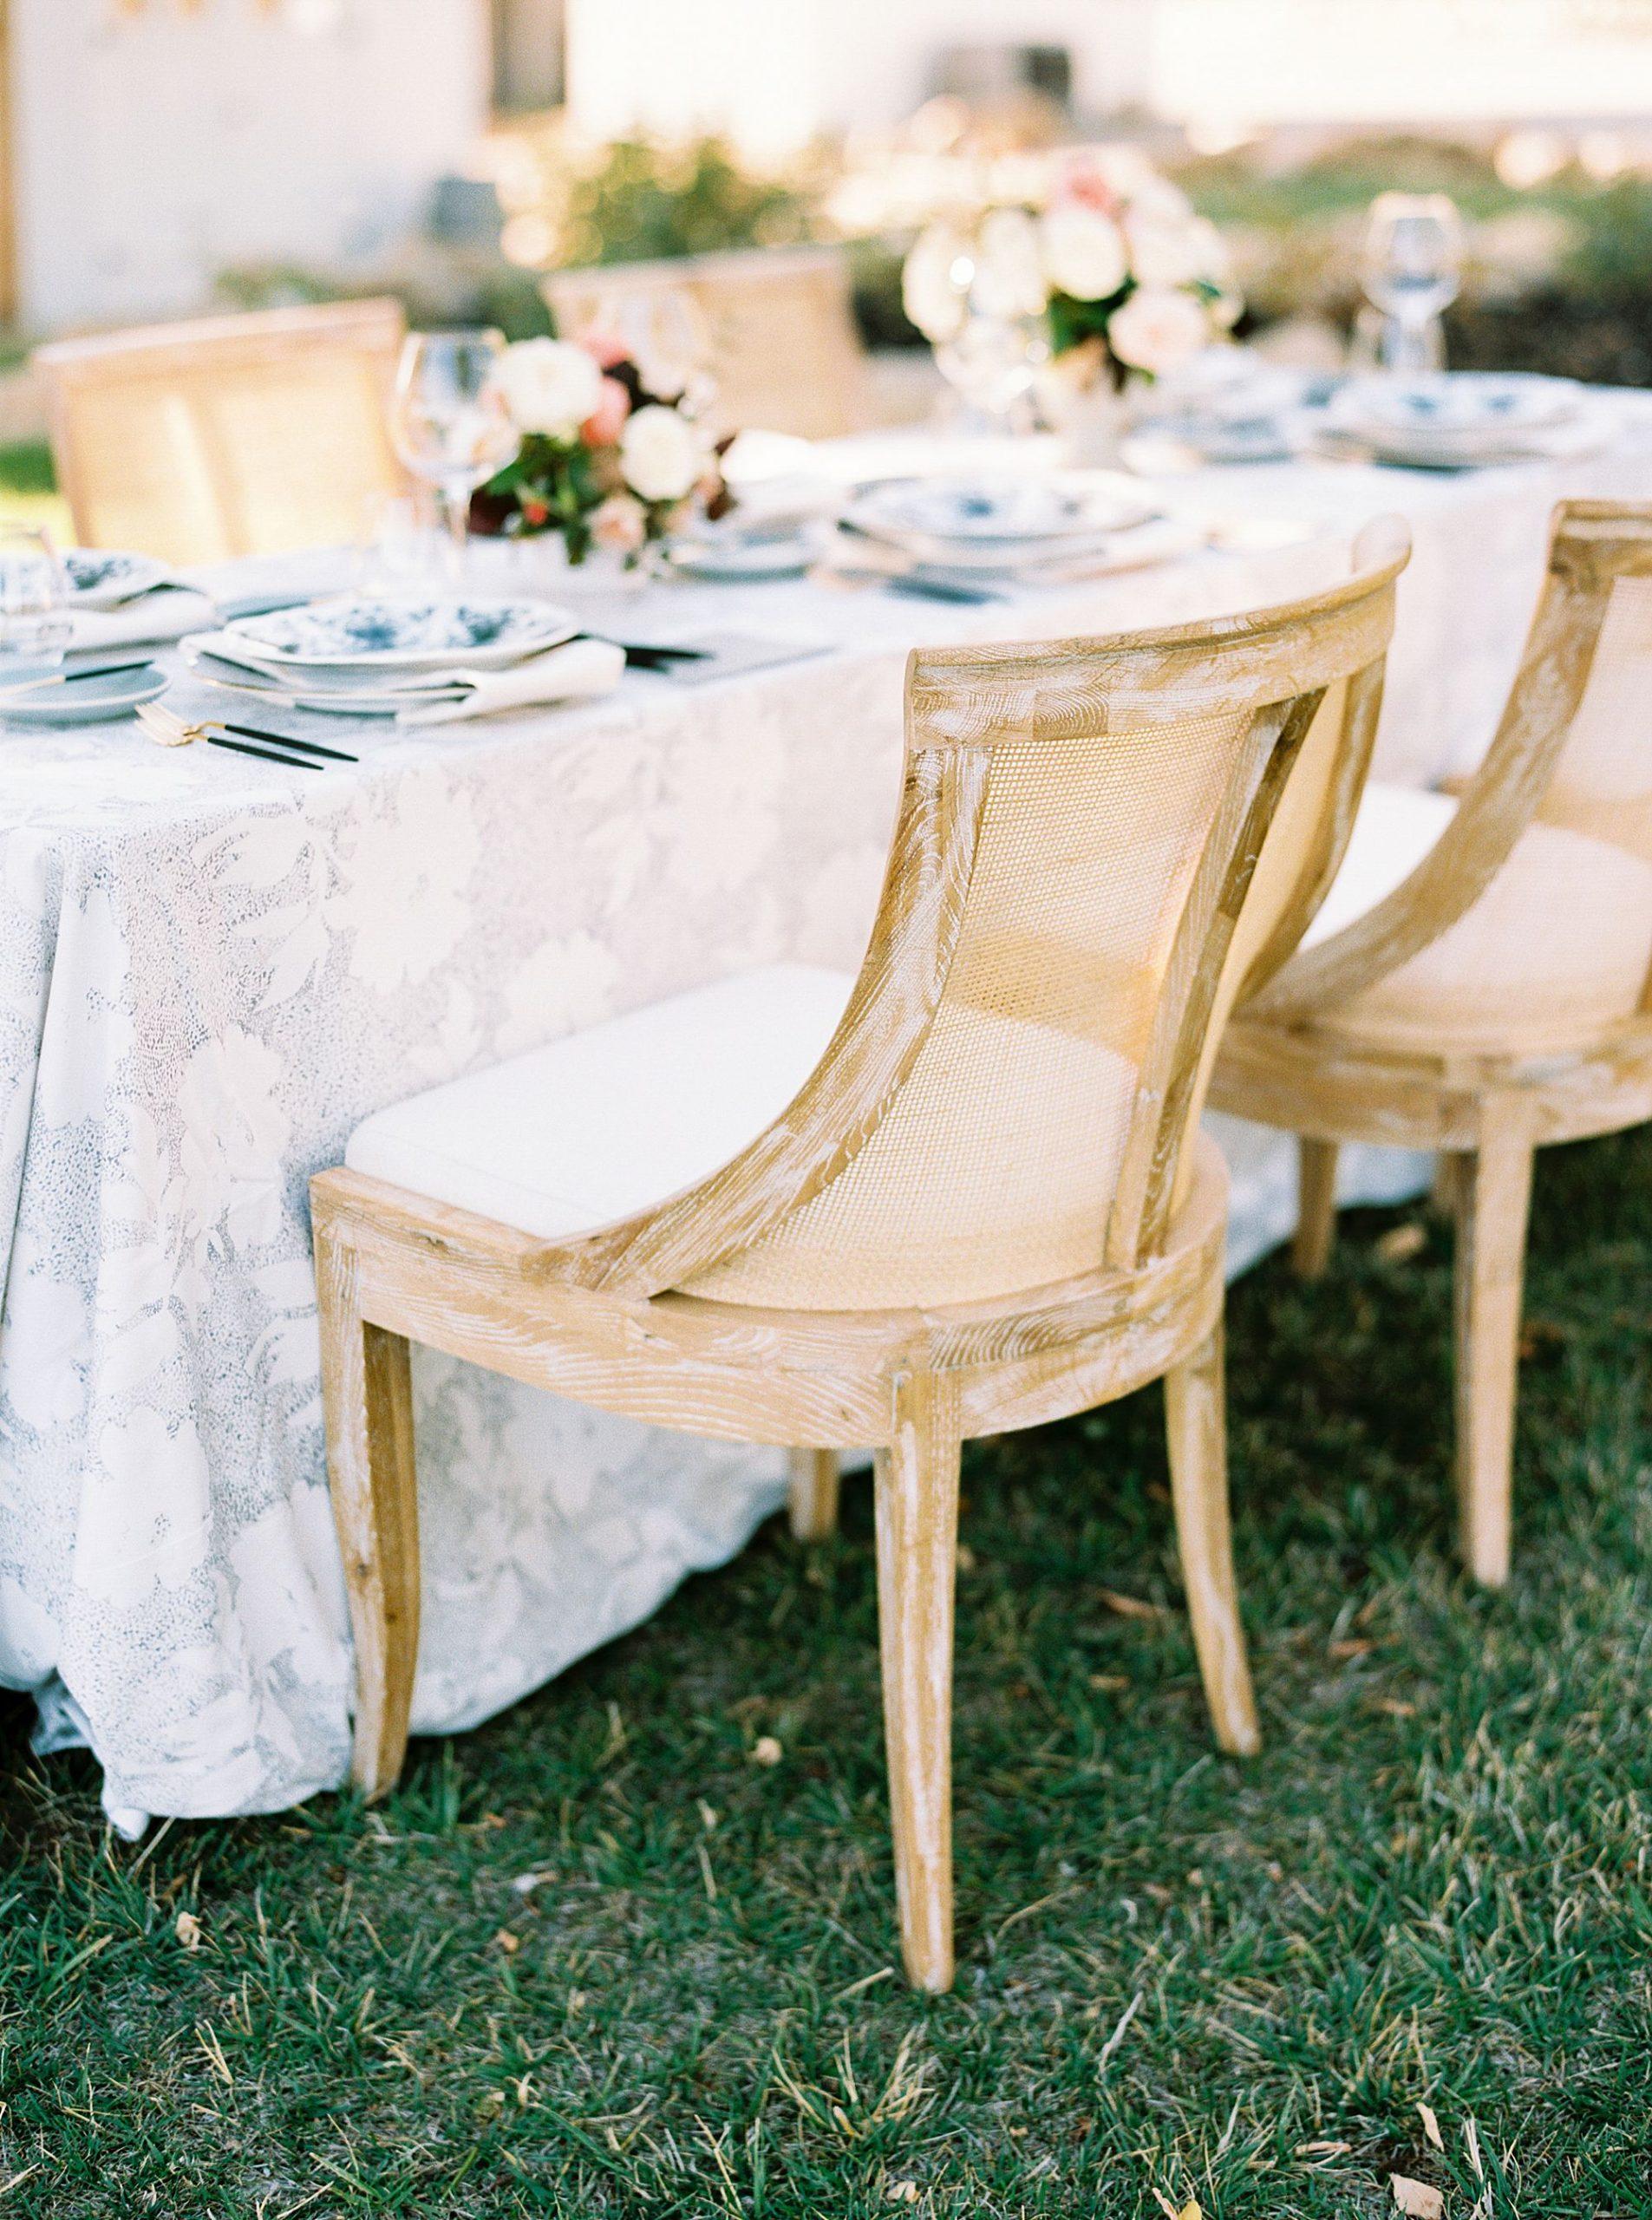 HammerSky Wedding Inspiration Featured on Hey Wedding Lady with Vanessa Noel Events - Ashley Baumgartner - SLO Wedding Photographer_0010.jpg